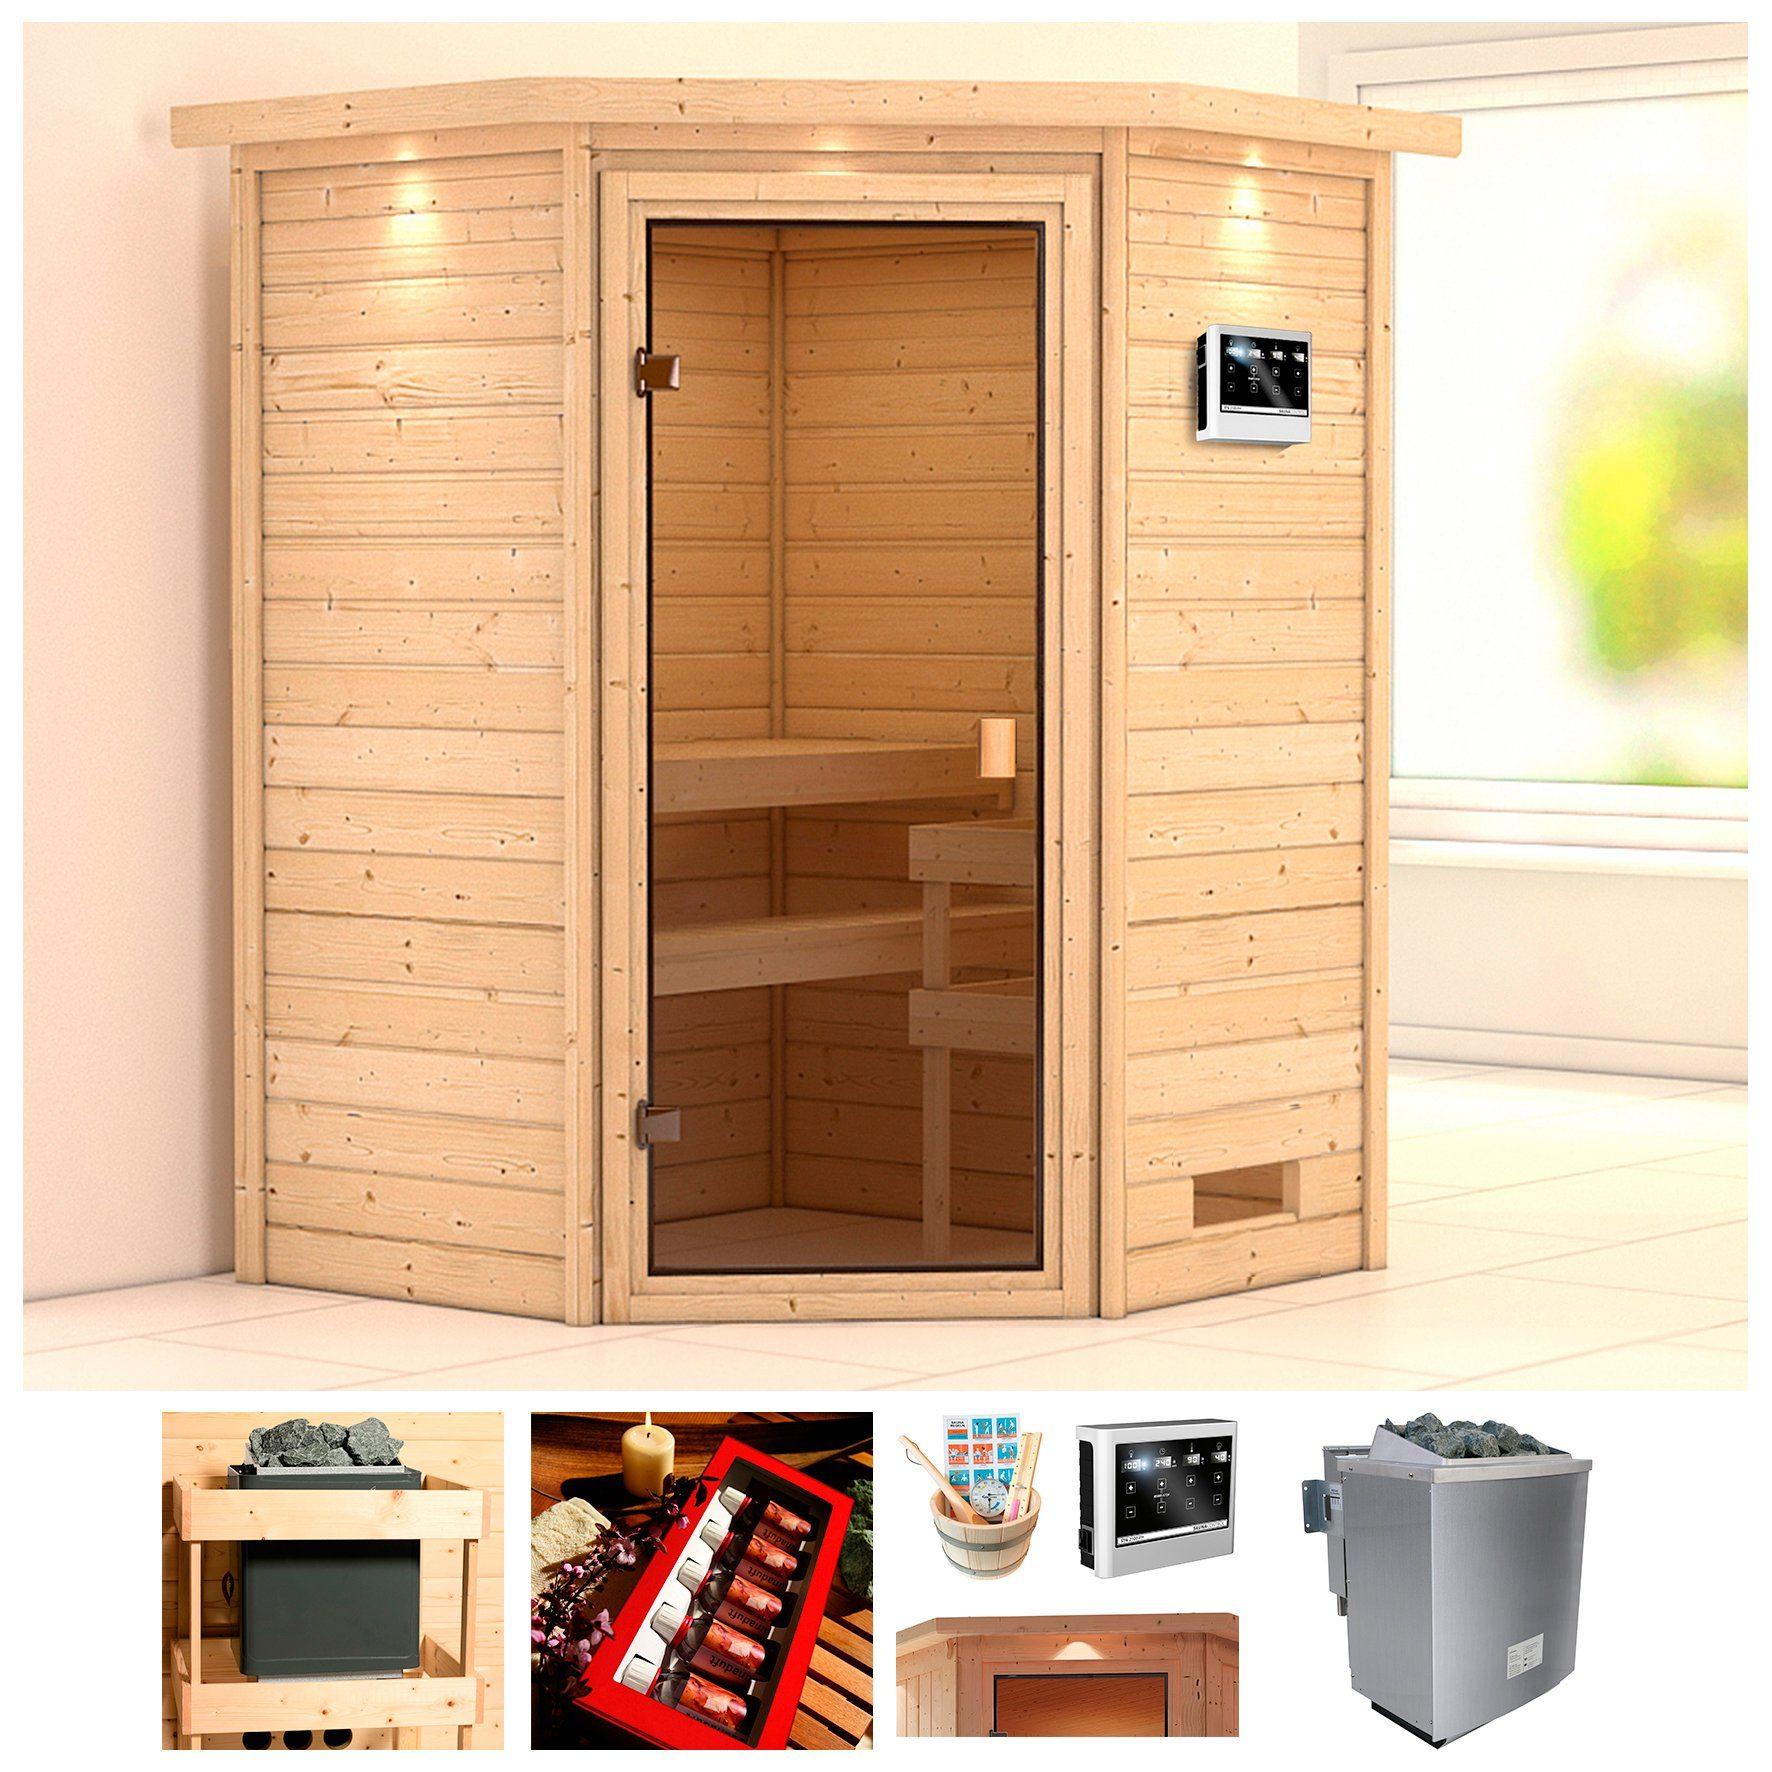 KARIBU Sauna »Wangerooge«, BxTxH: 174x160x191 cm, 9 kW Bio-Kombiofen mit ext. Steuerung